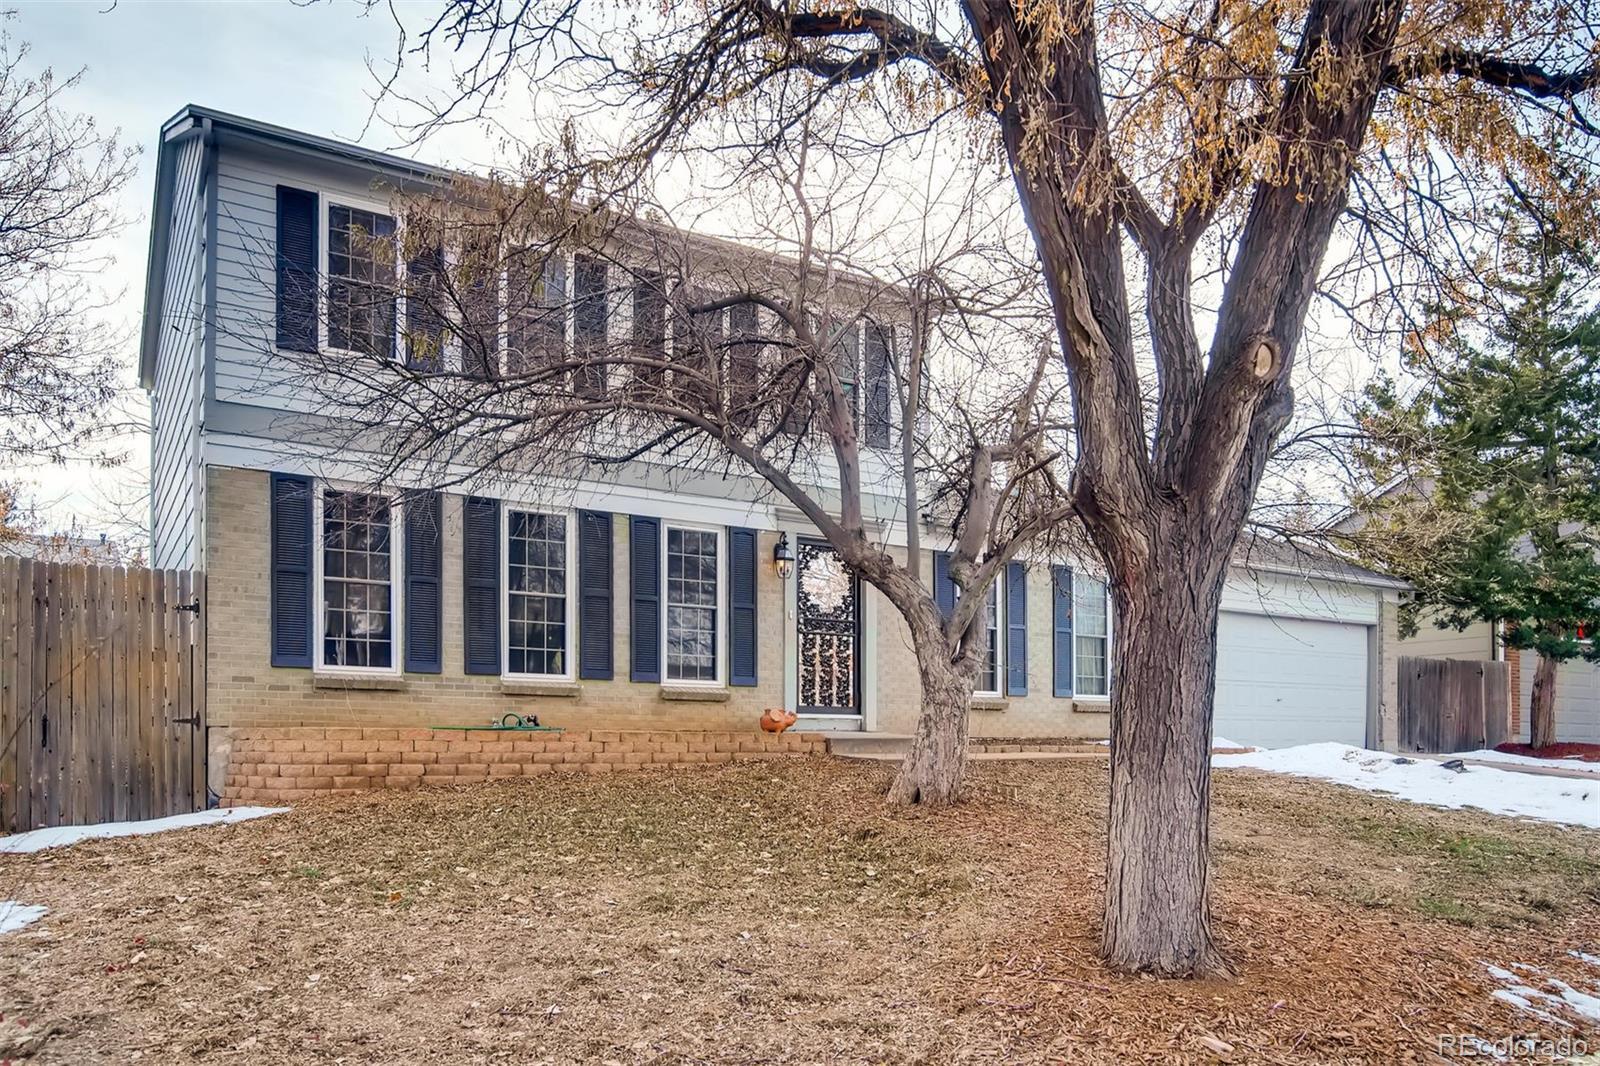 2442 S Eagle Way Property Photo - Aurora, CO real estate listing